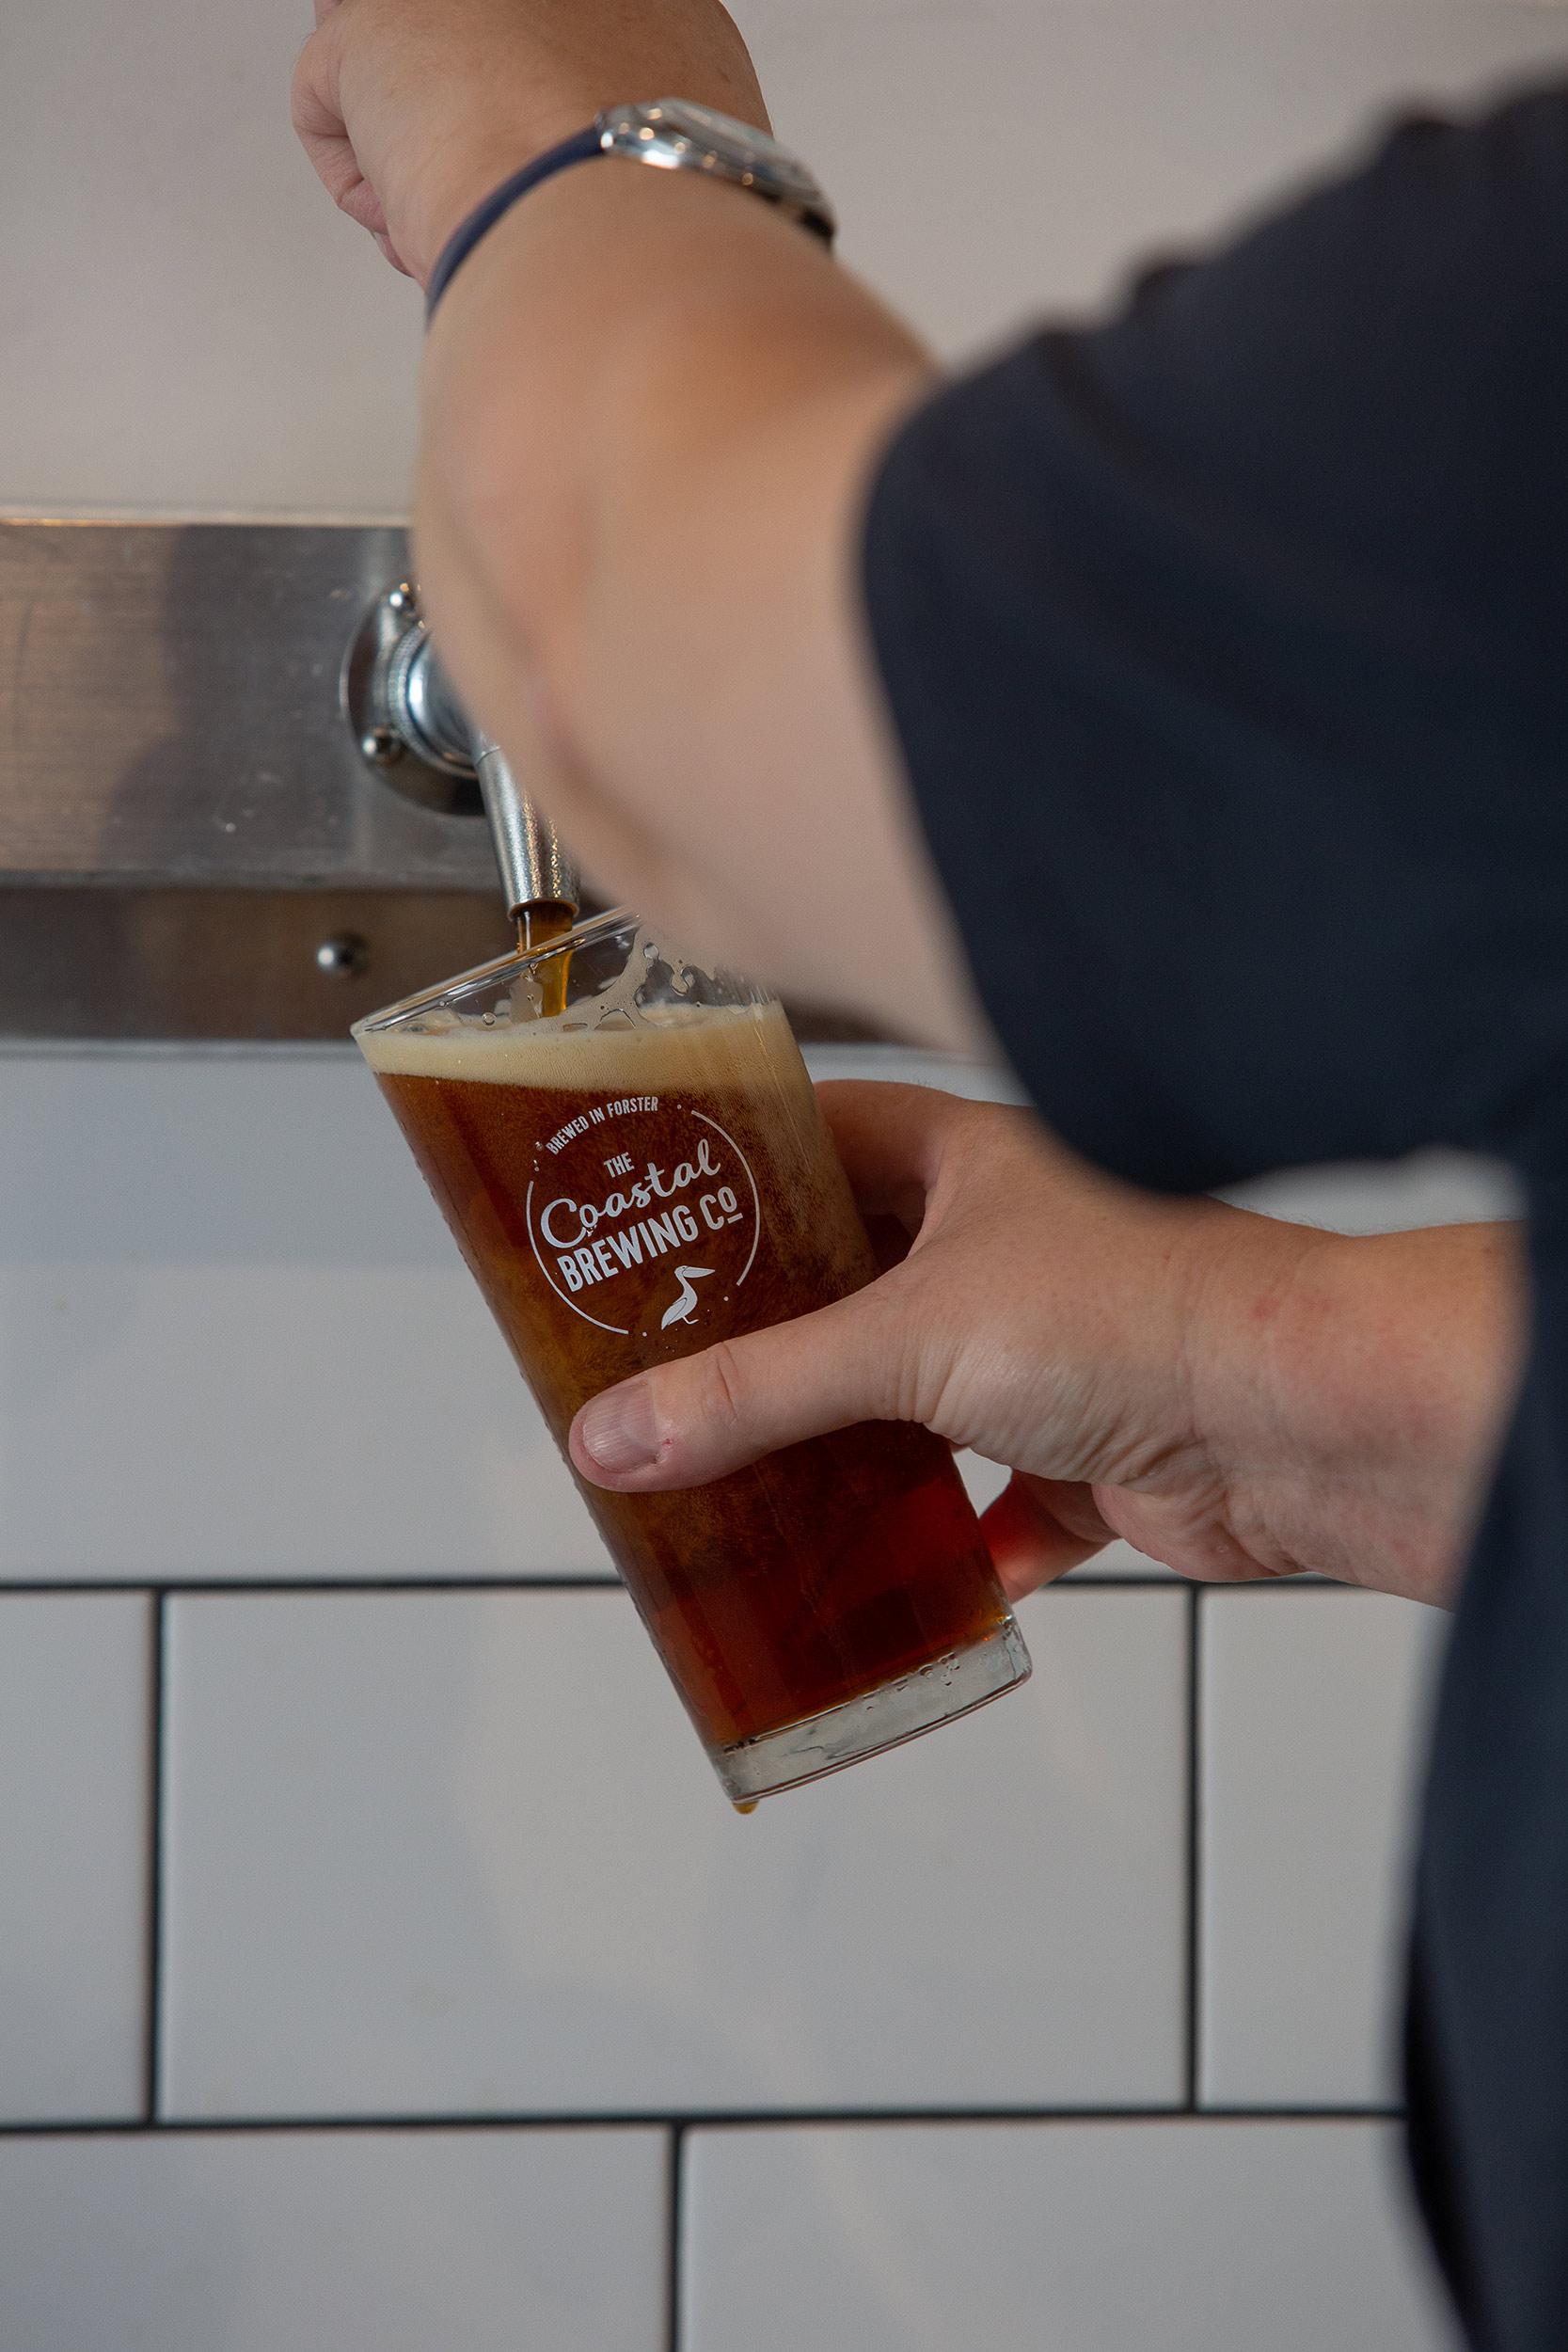 glft-coastal-brewing-local-micro-brewery.jpg